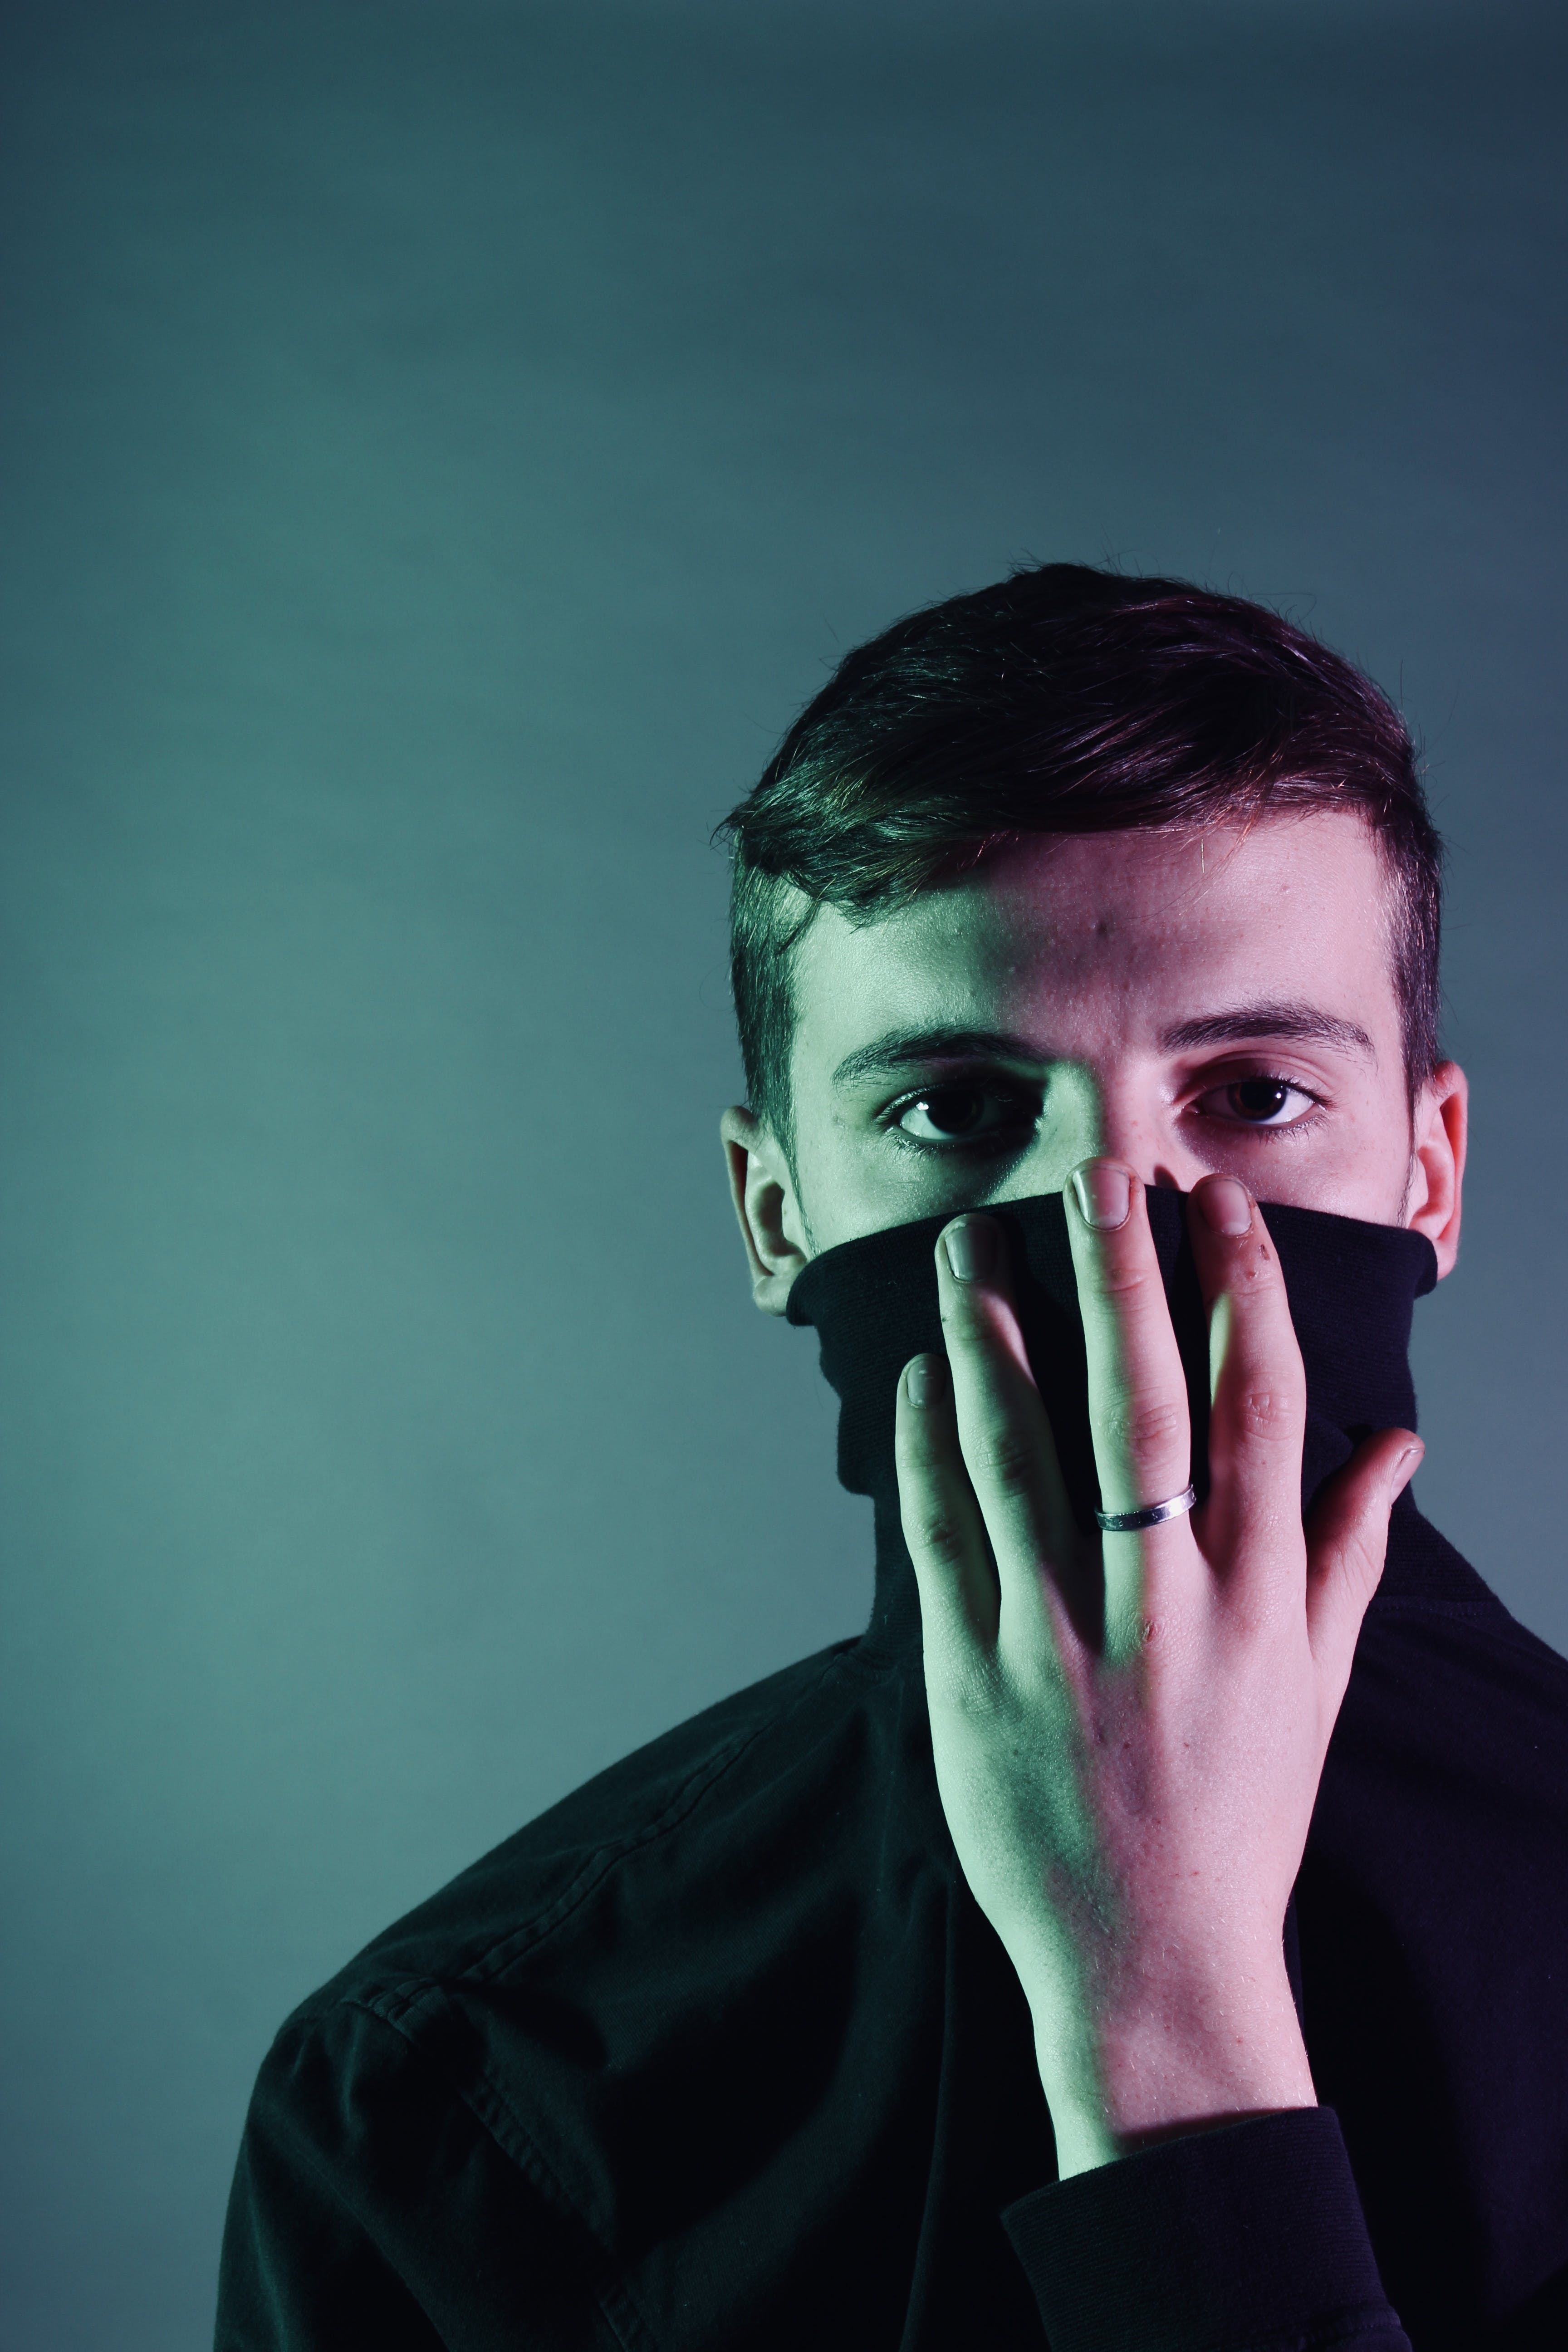 Man Holding Black Mask